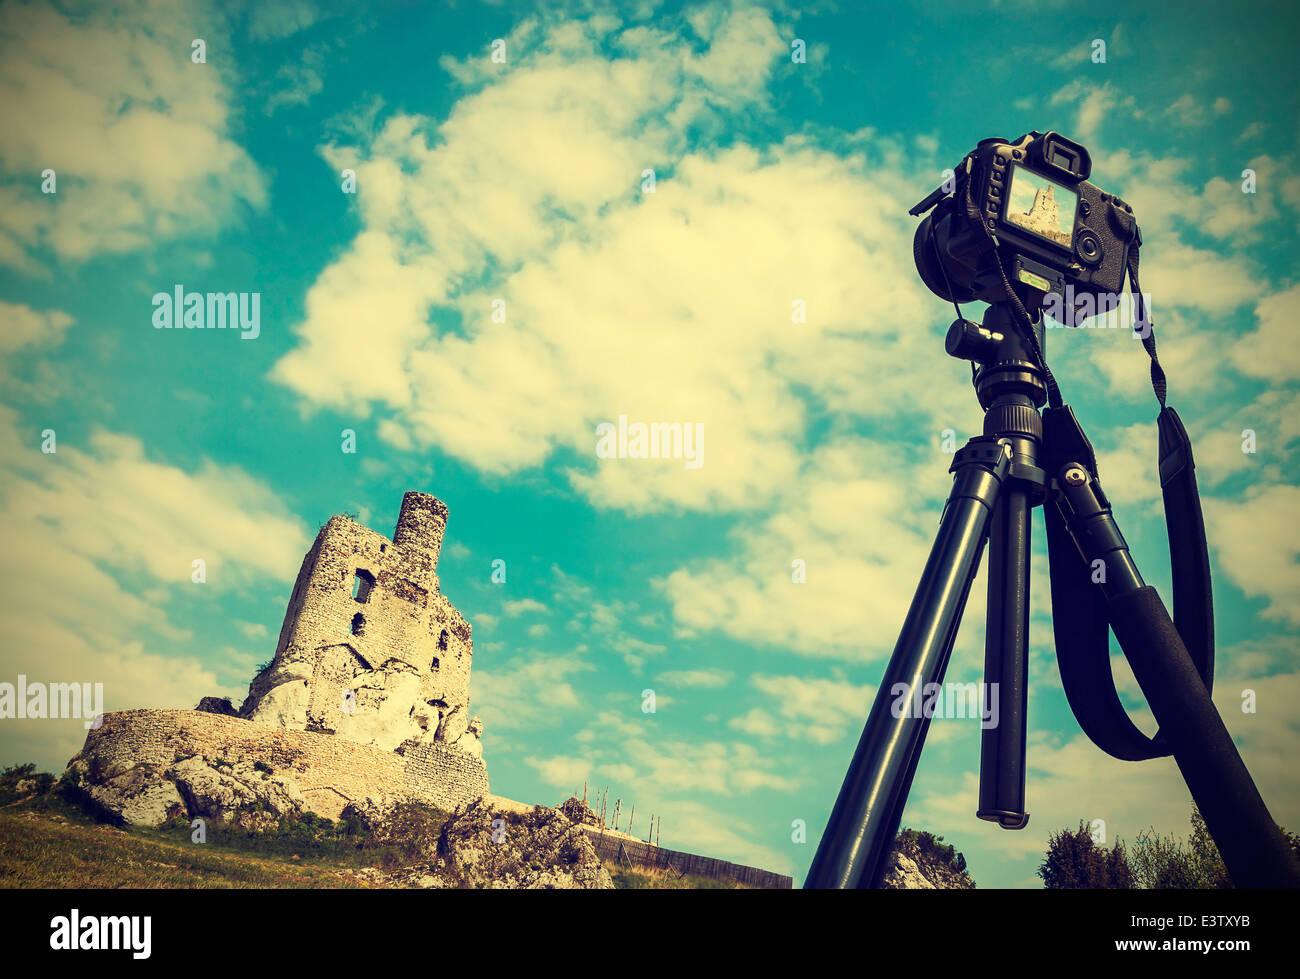 Kamera auf Stativ mit Sommerlandschaft mit Ruinen, Vintage-retro-Stil. Stockbild